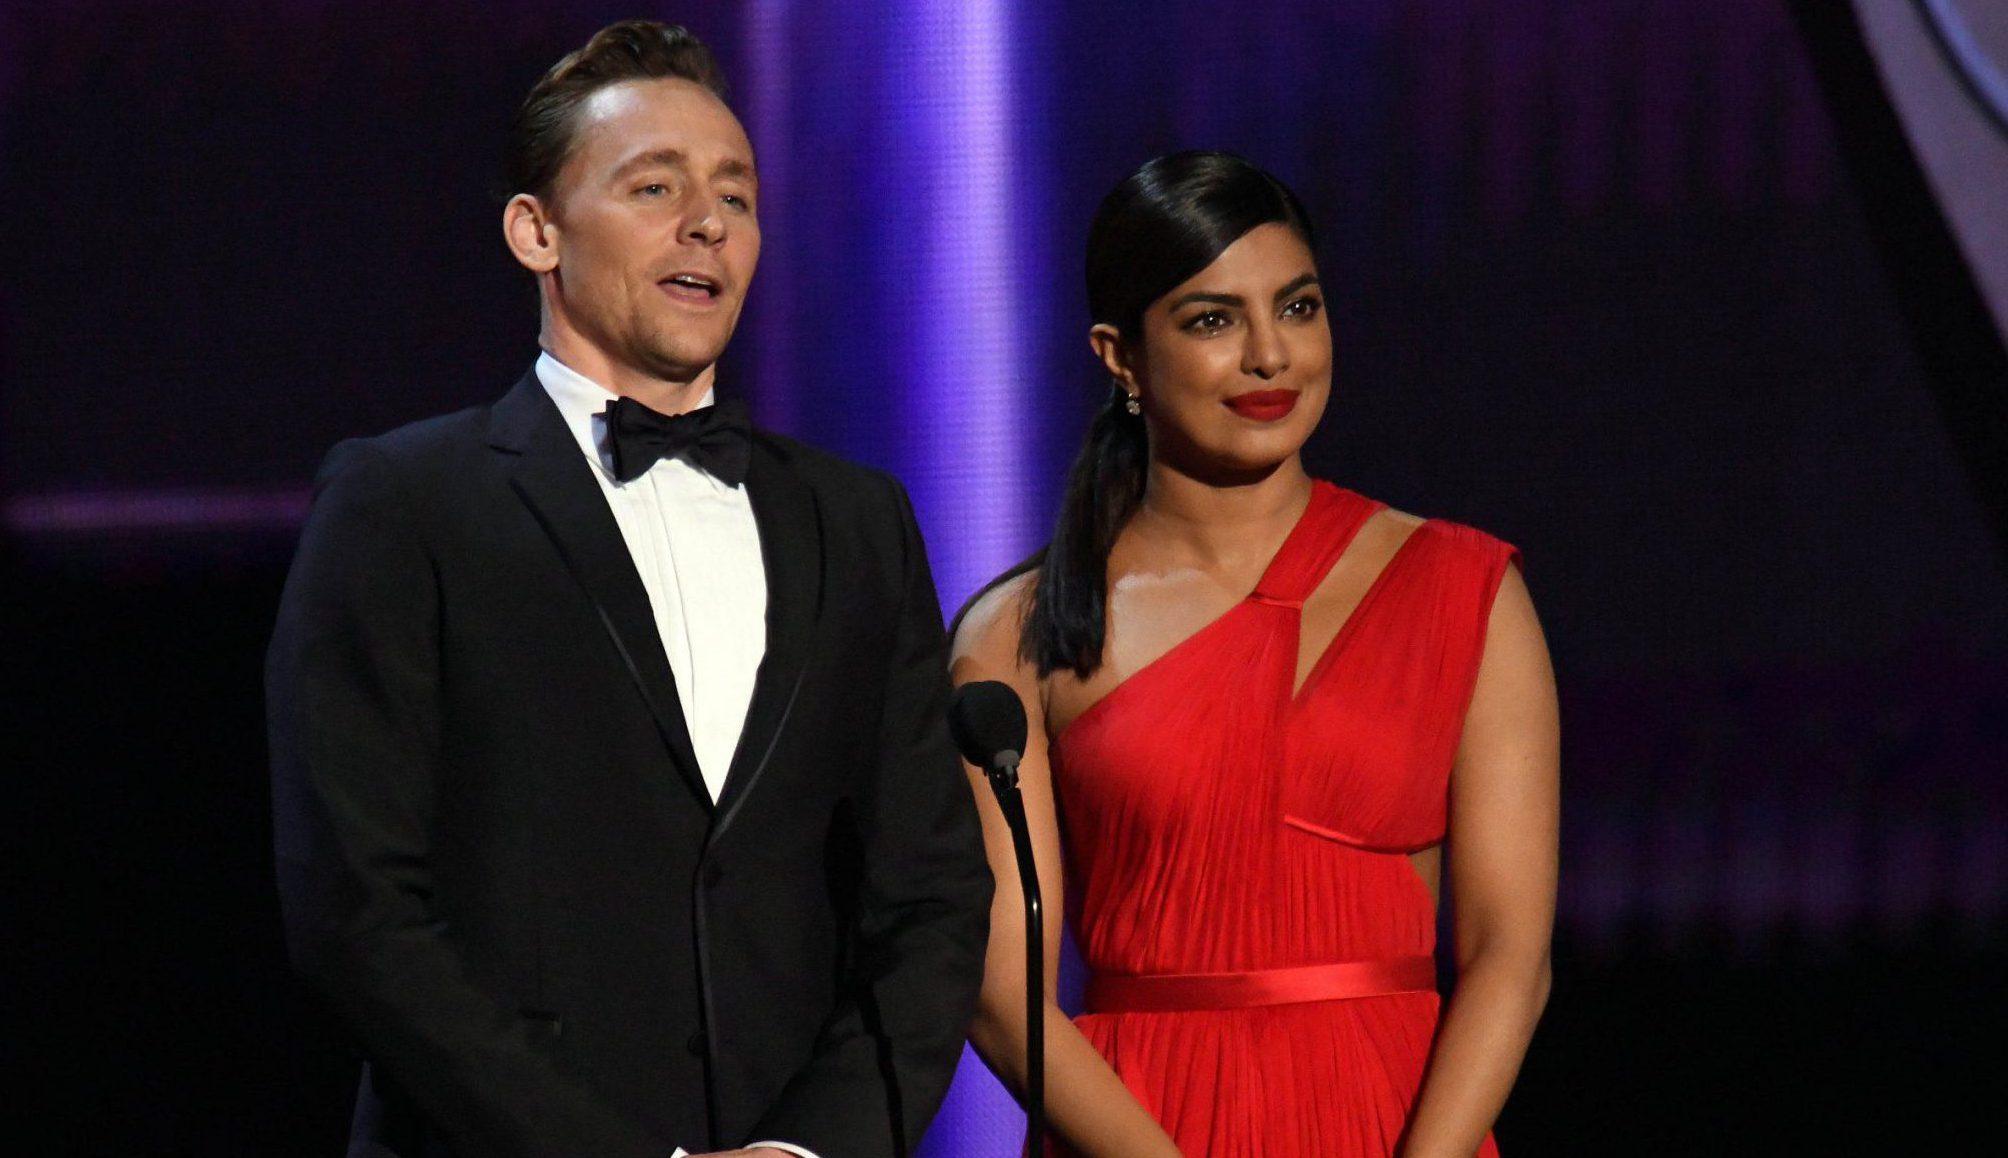 Tom Hiddleston has been caught 'openly flirting' with Priyanka Chopra